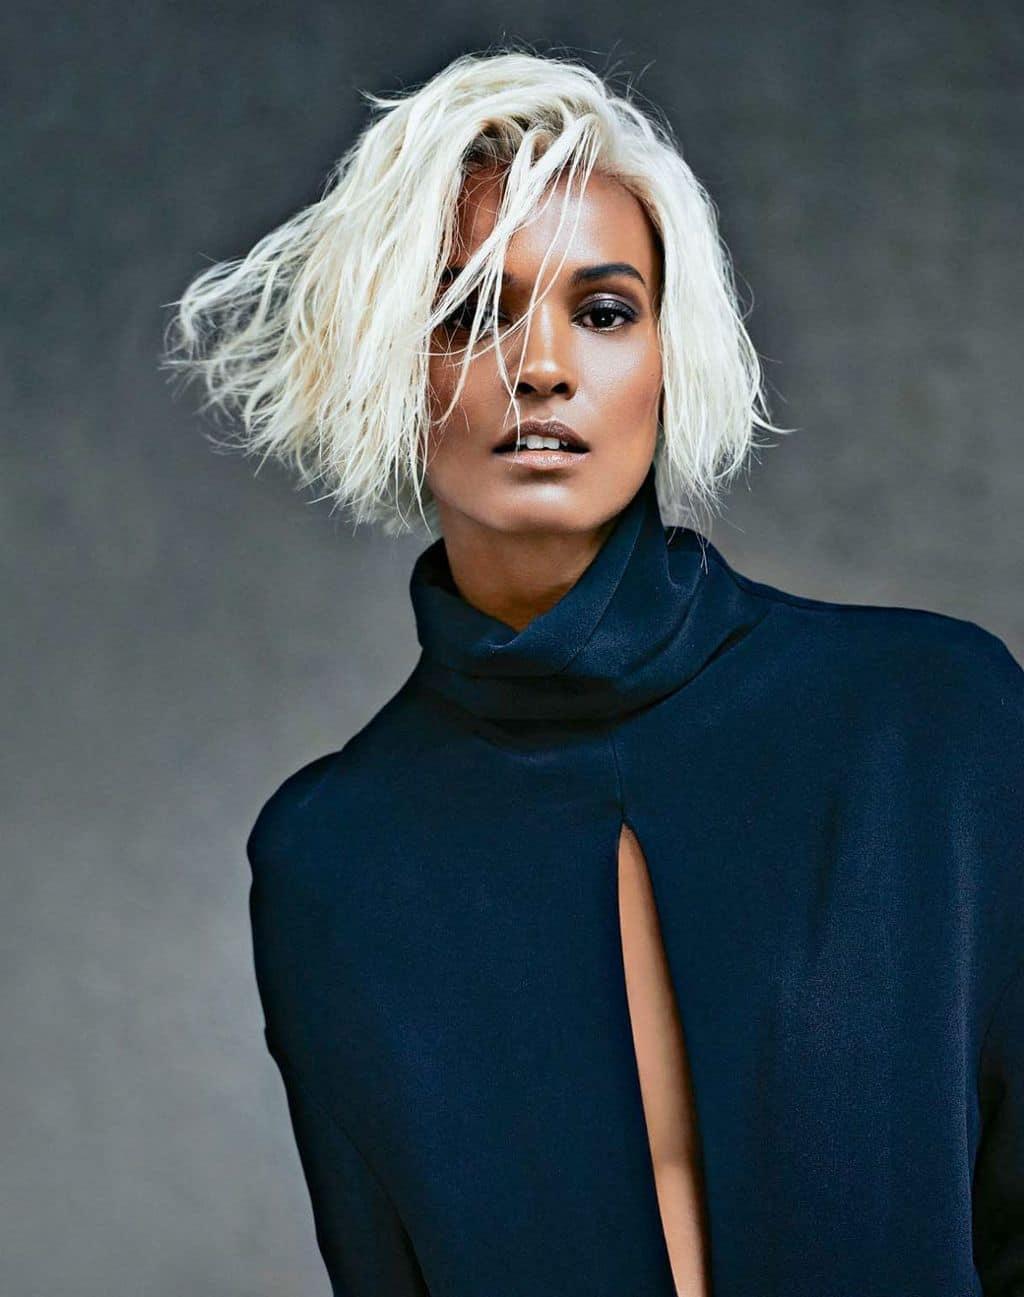 White Hair Ideas For Dark Skin 5 Beautiful Blends